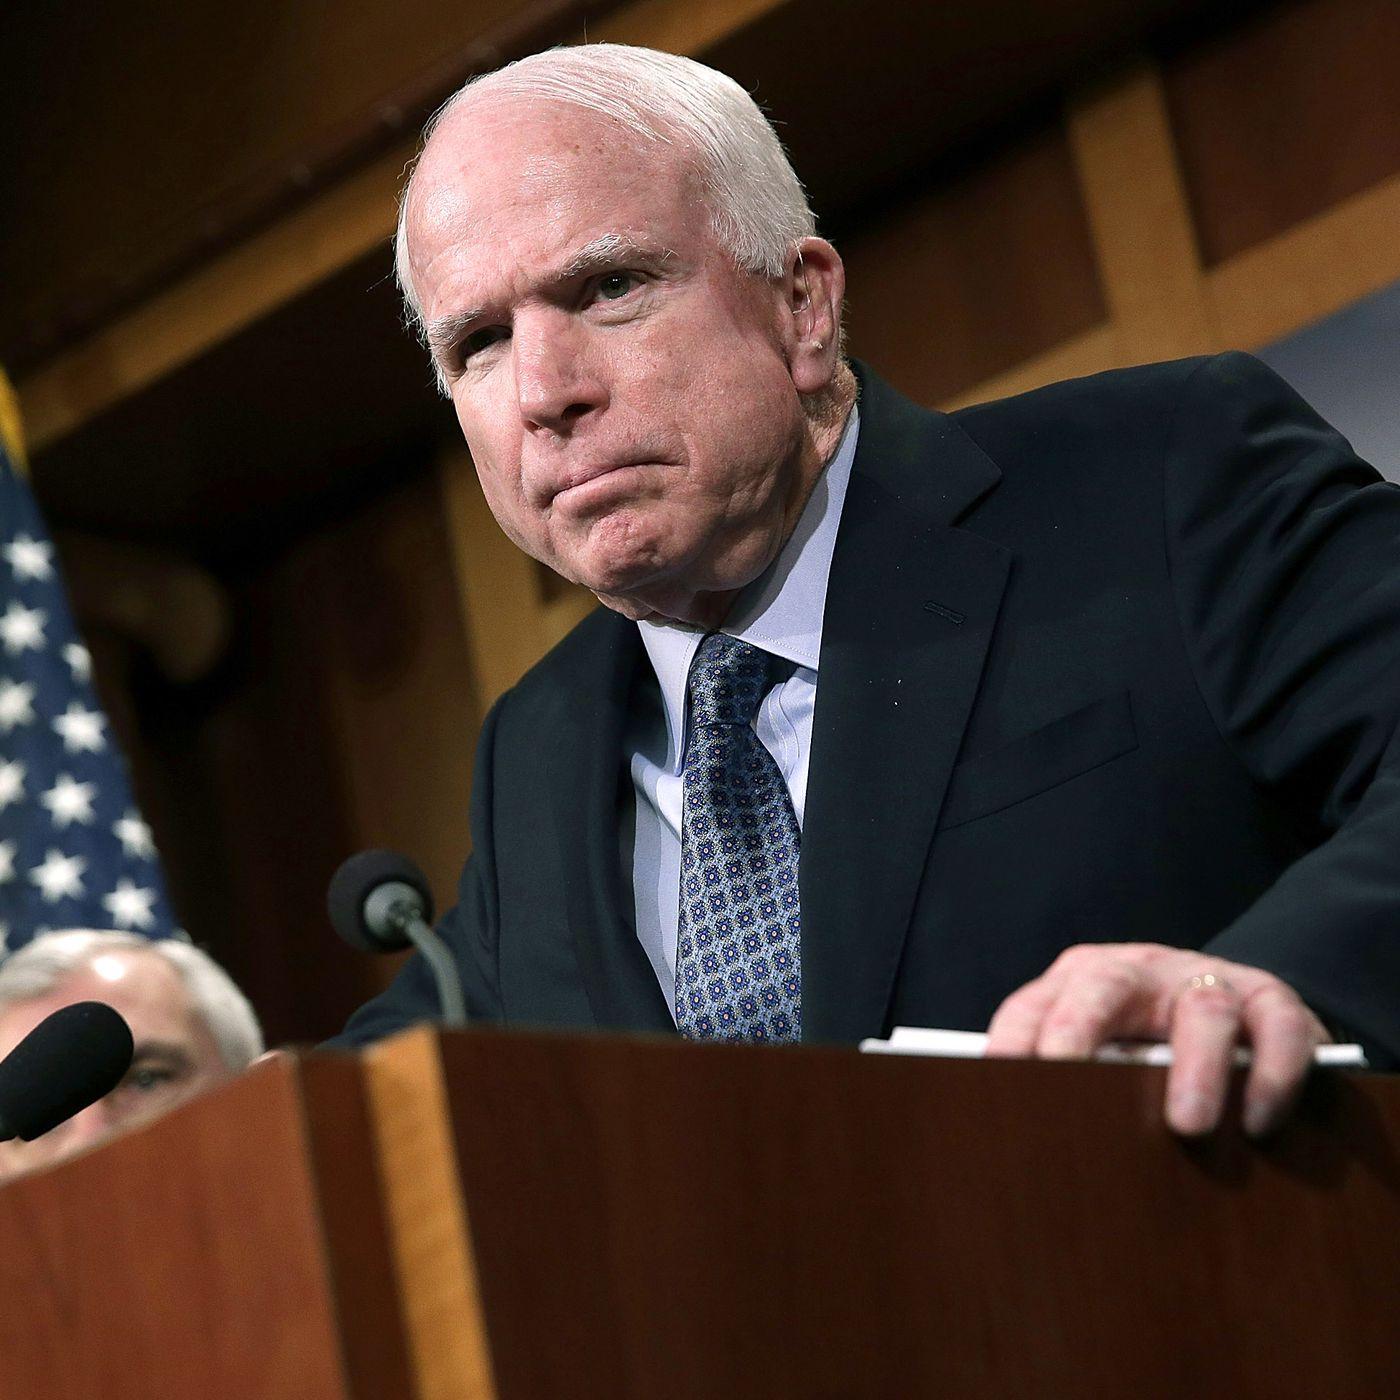 vox.com - Dylan Scott - No, John McCain did not make Republicans lose the House